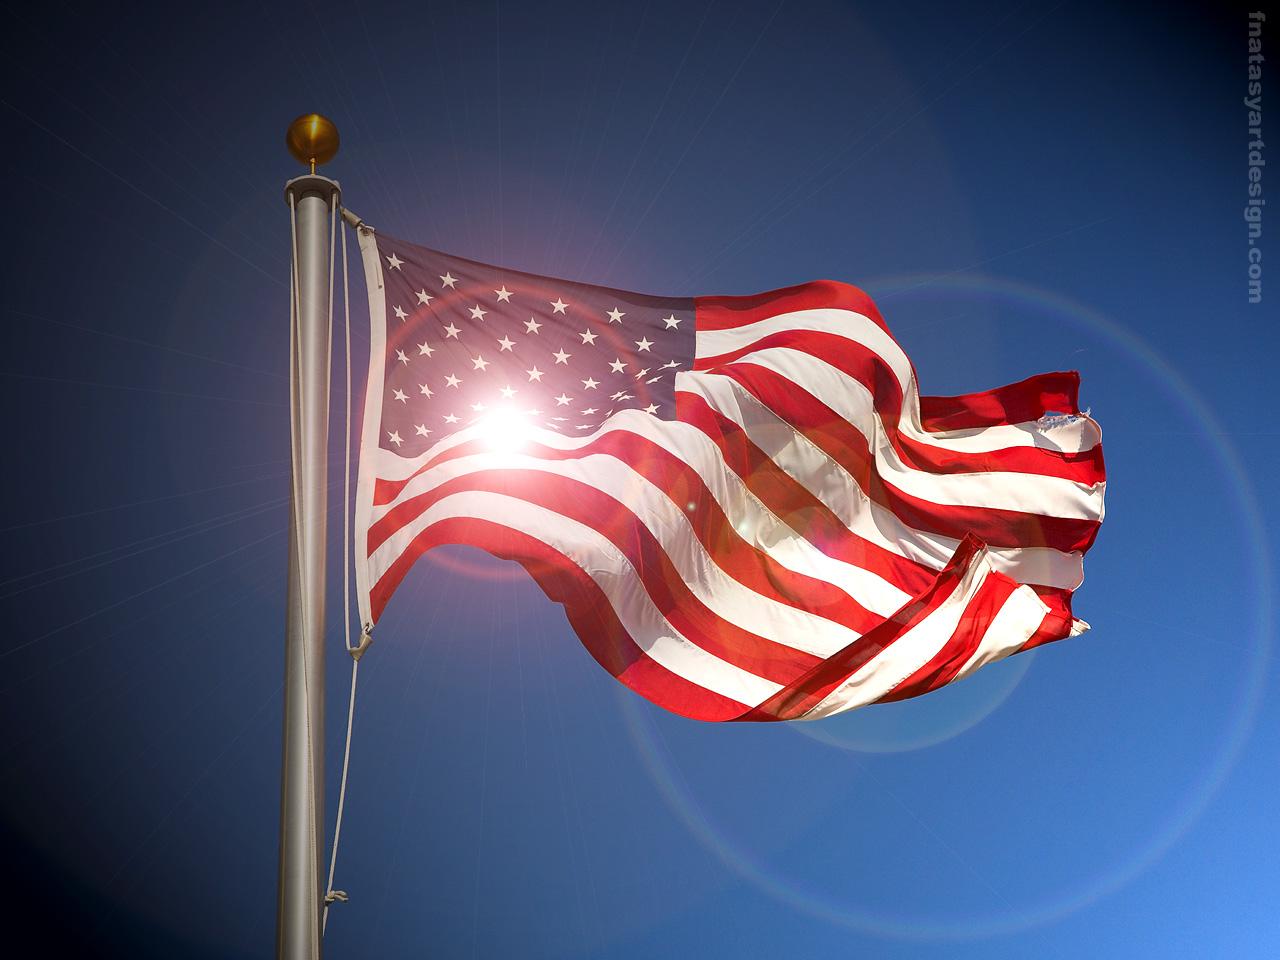 American flag desktop sunrise Photo Manipulation Abstract 1280x960